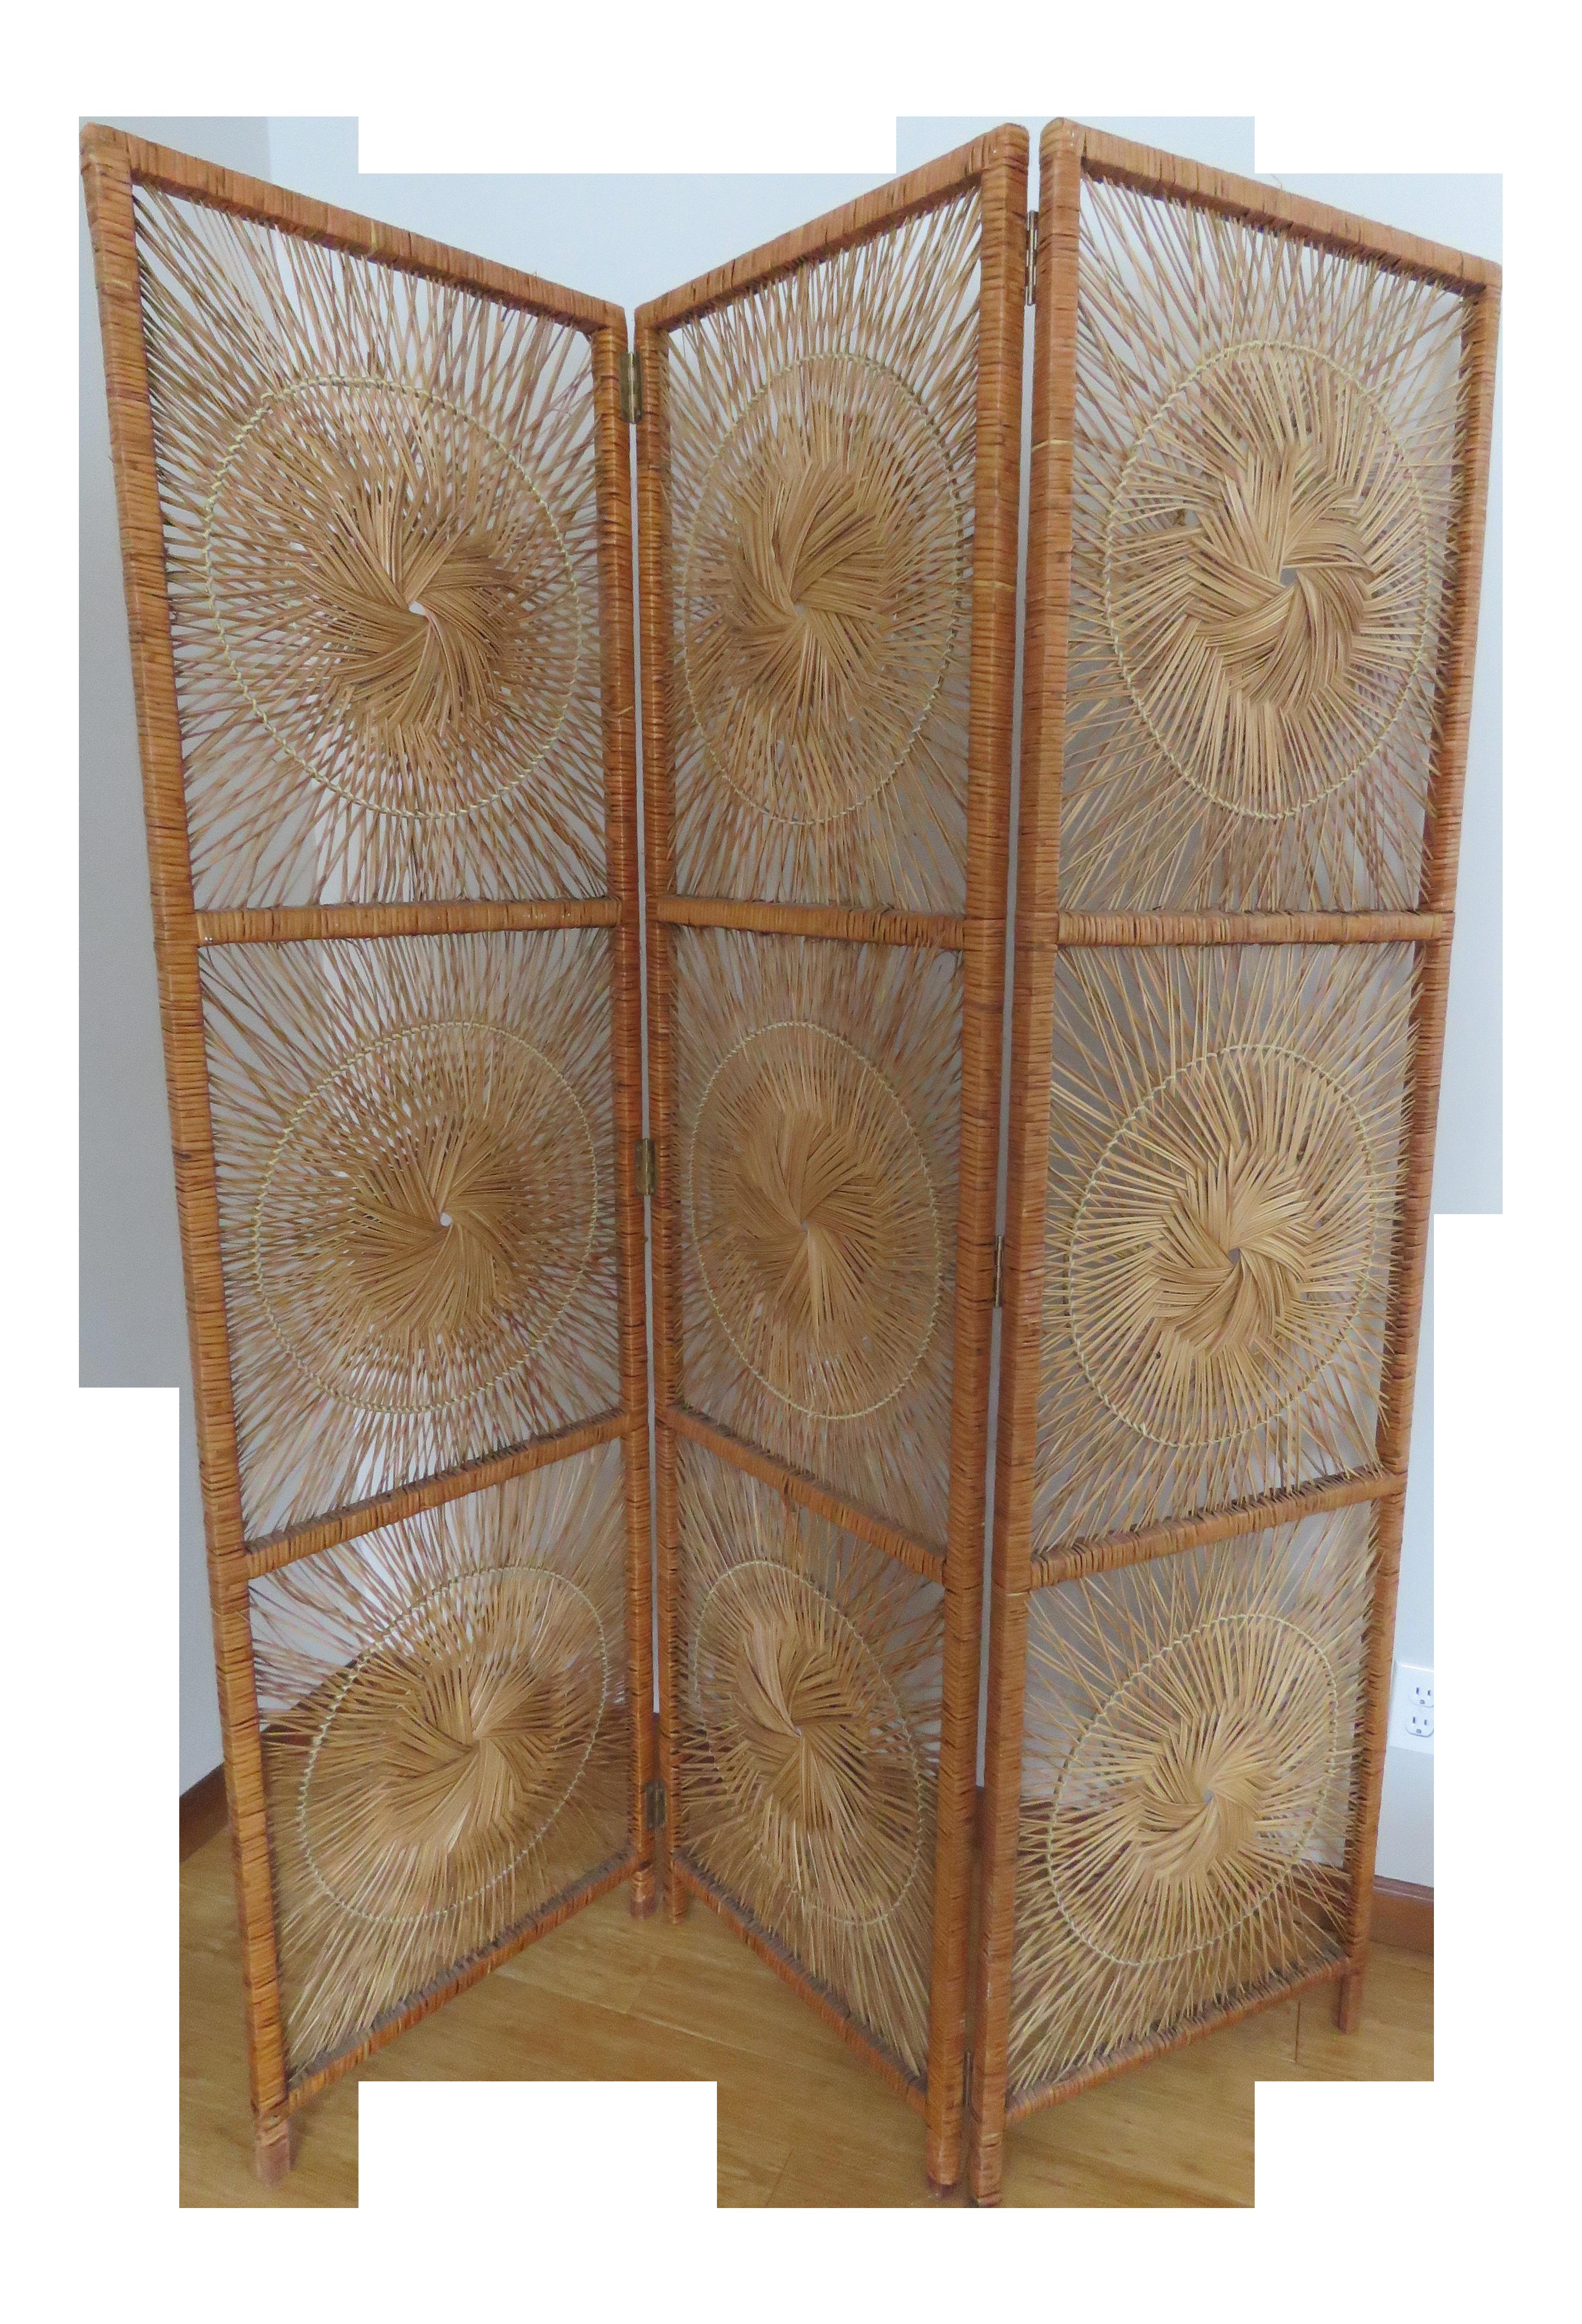 6ee7578fe8ea8 Vintage Wicker Rattan Bohemian Sunburst Room Divider Screen